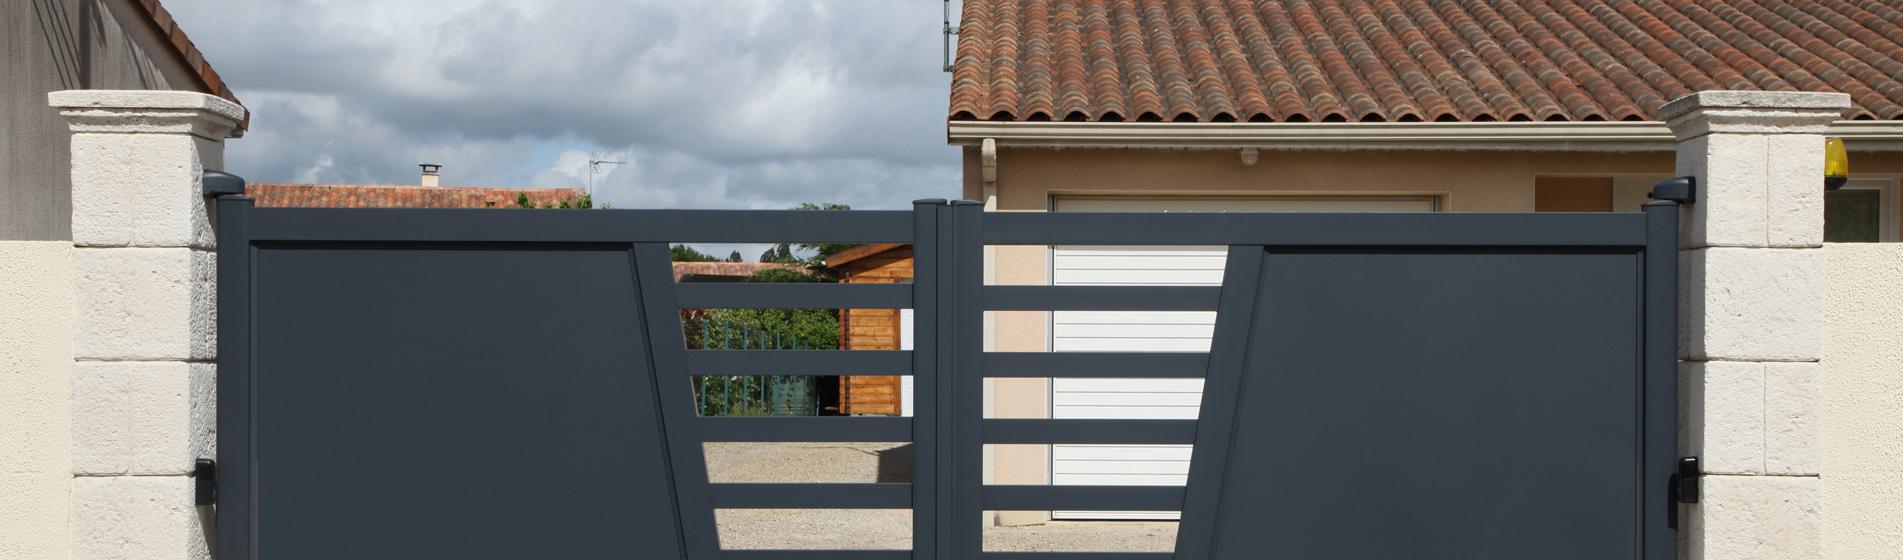 rénovation portail battant avec portillon 30 Gard